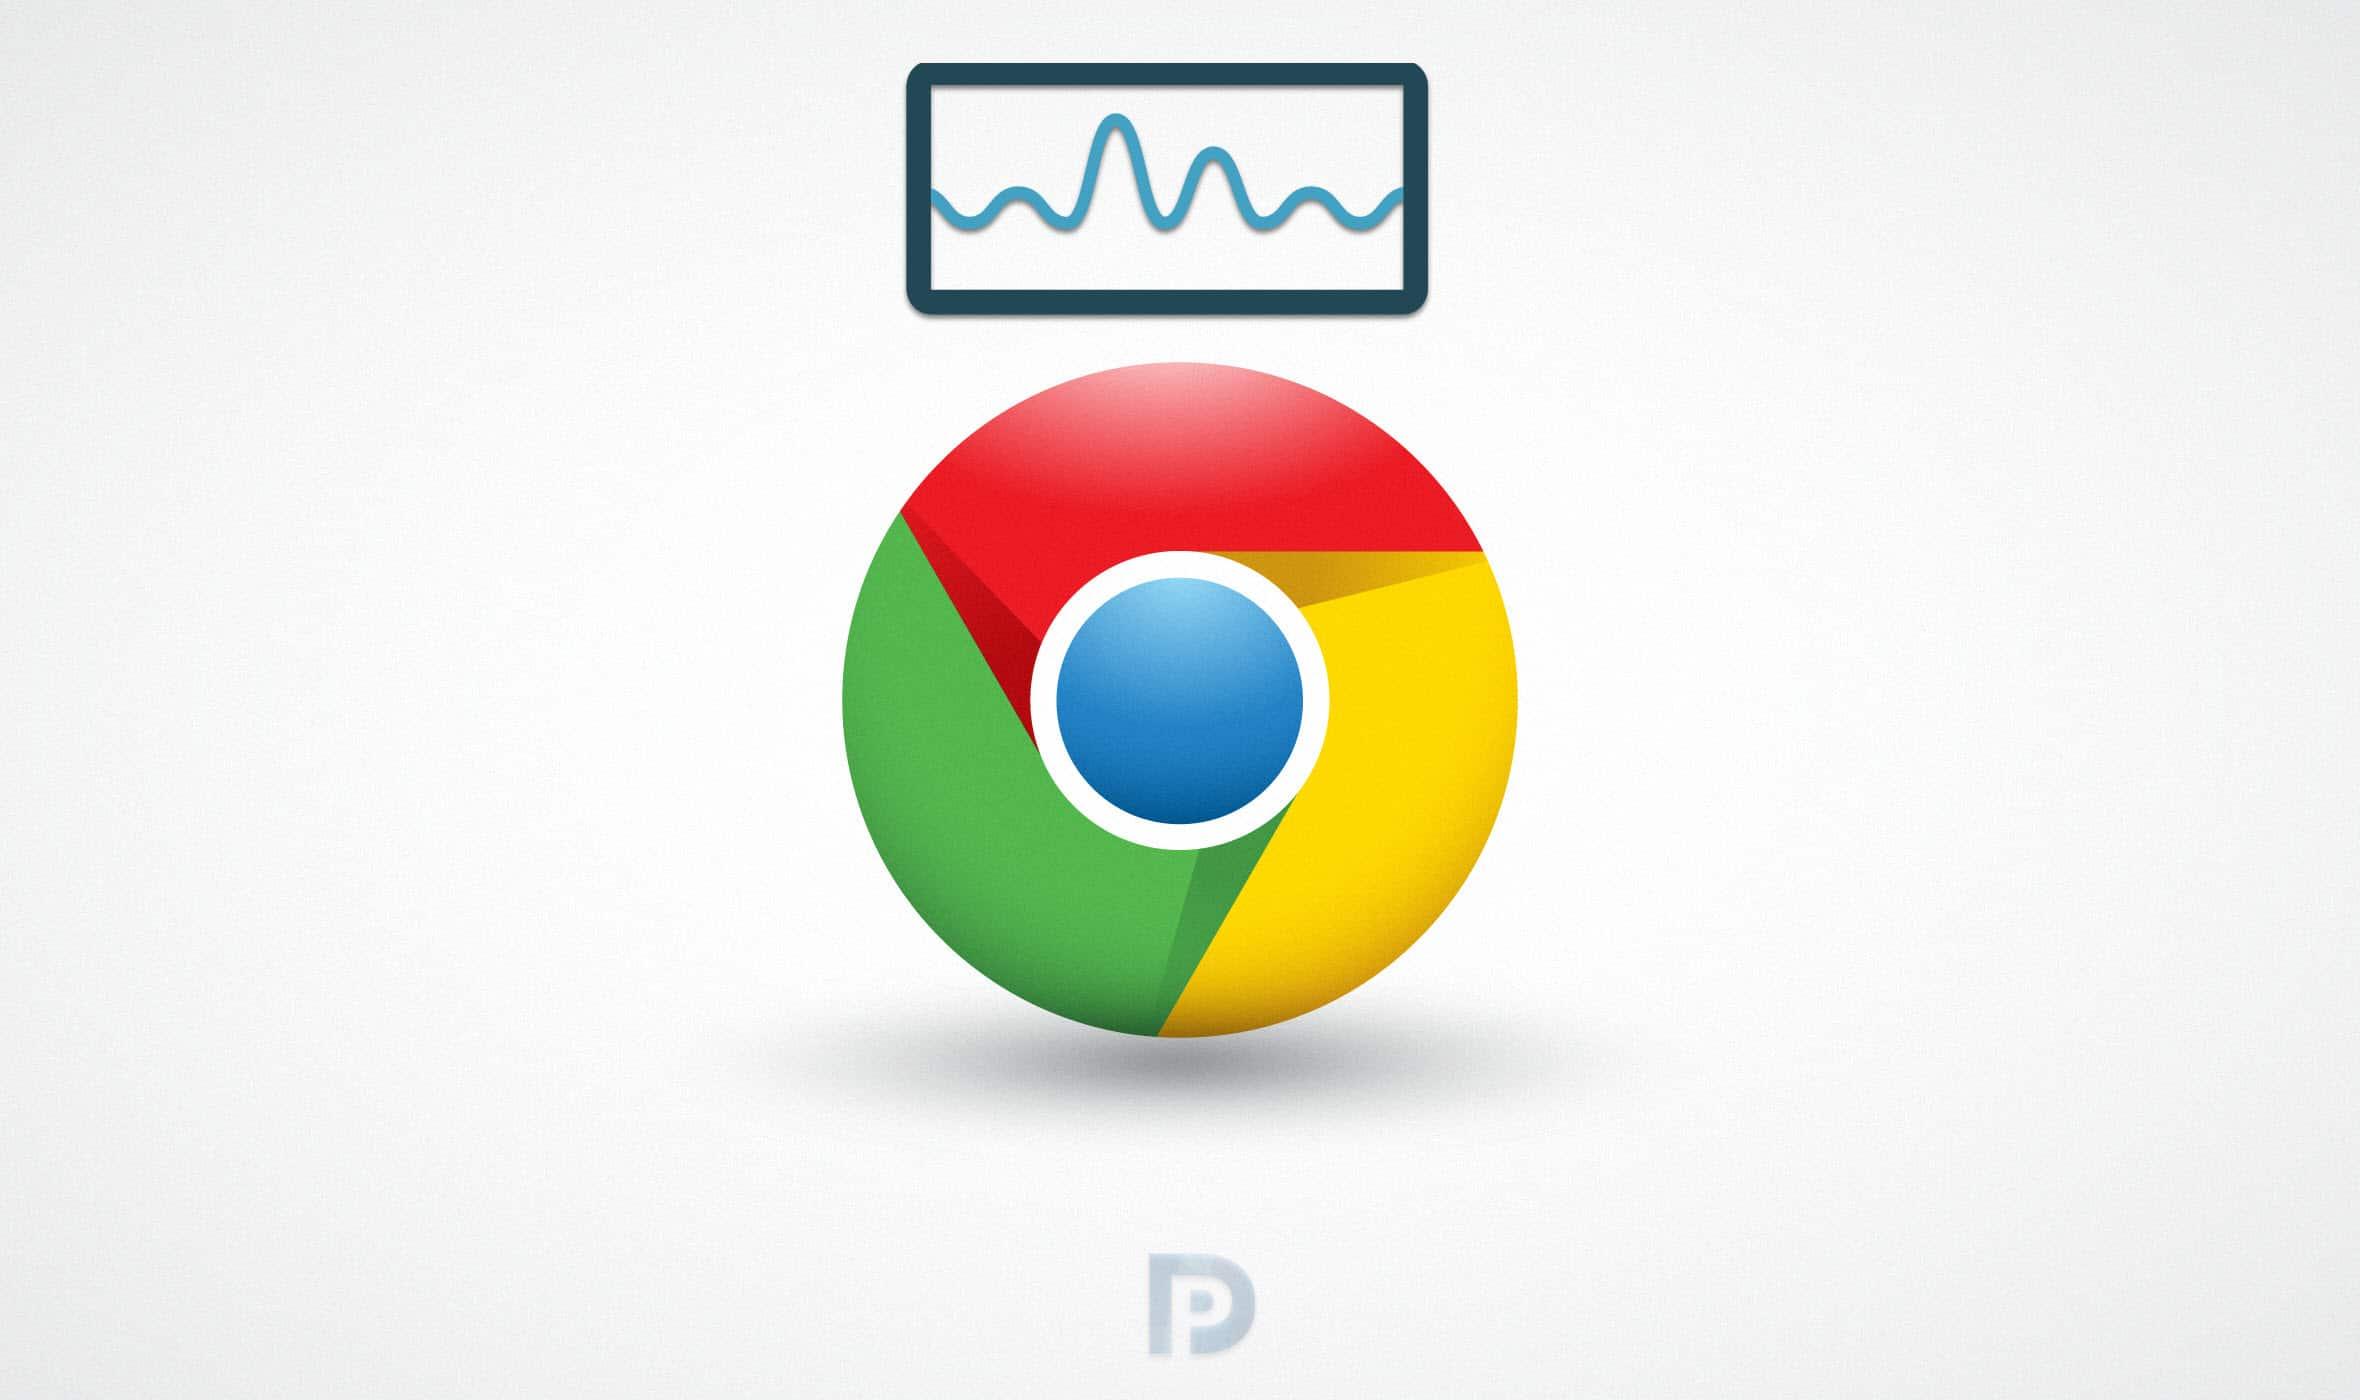 Chrome will consume more RAM